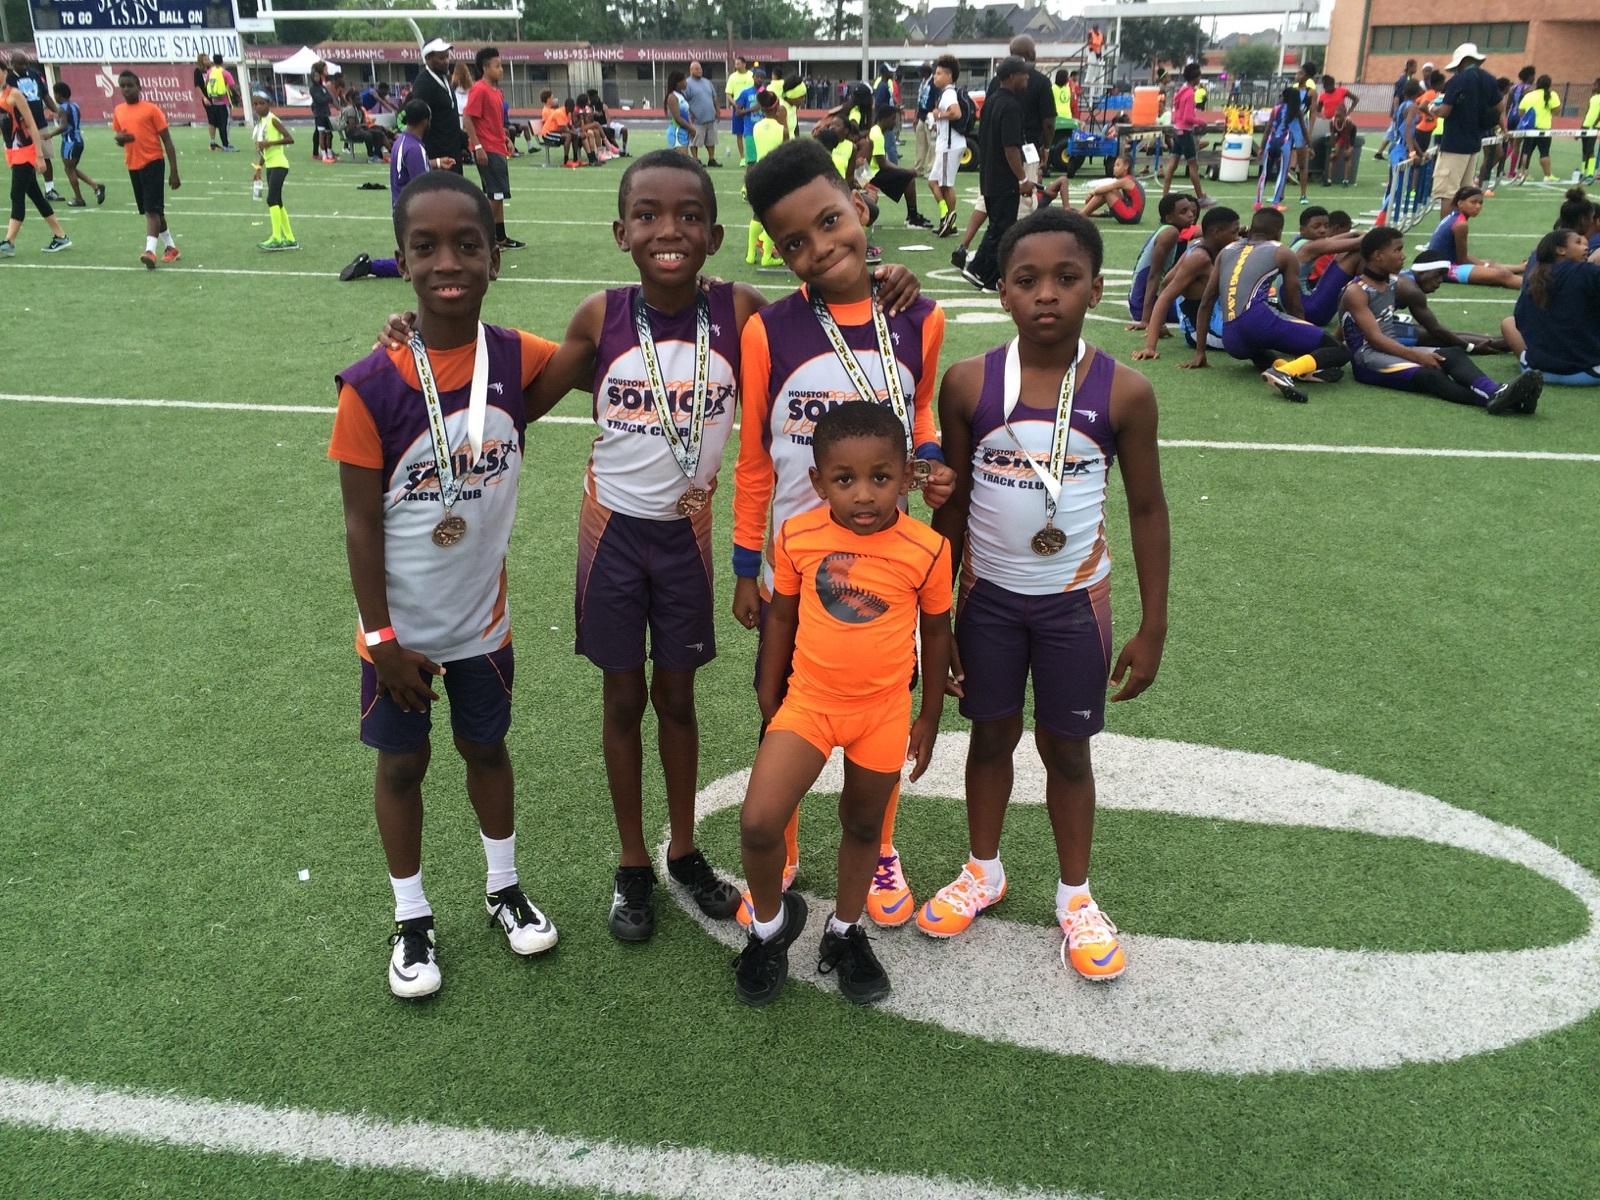 Bantam Boys 4x400 relay champs